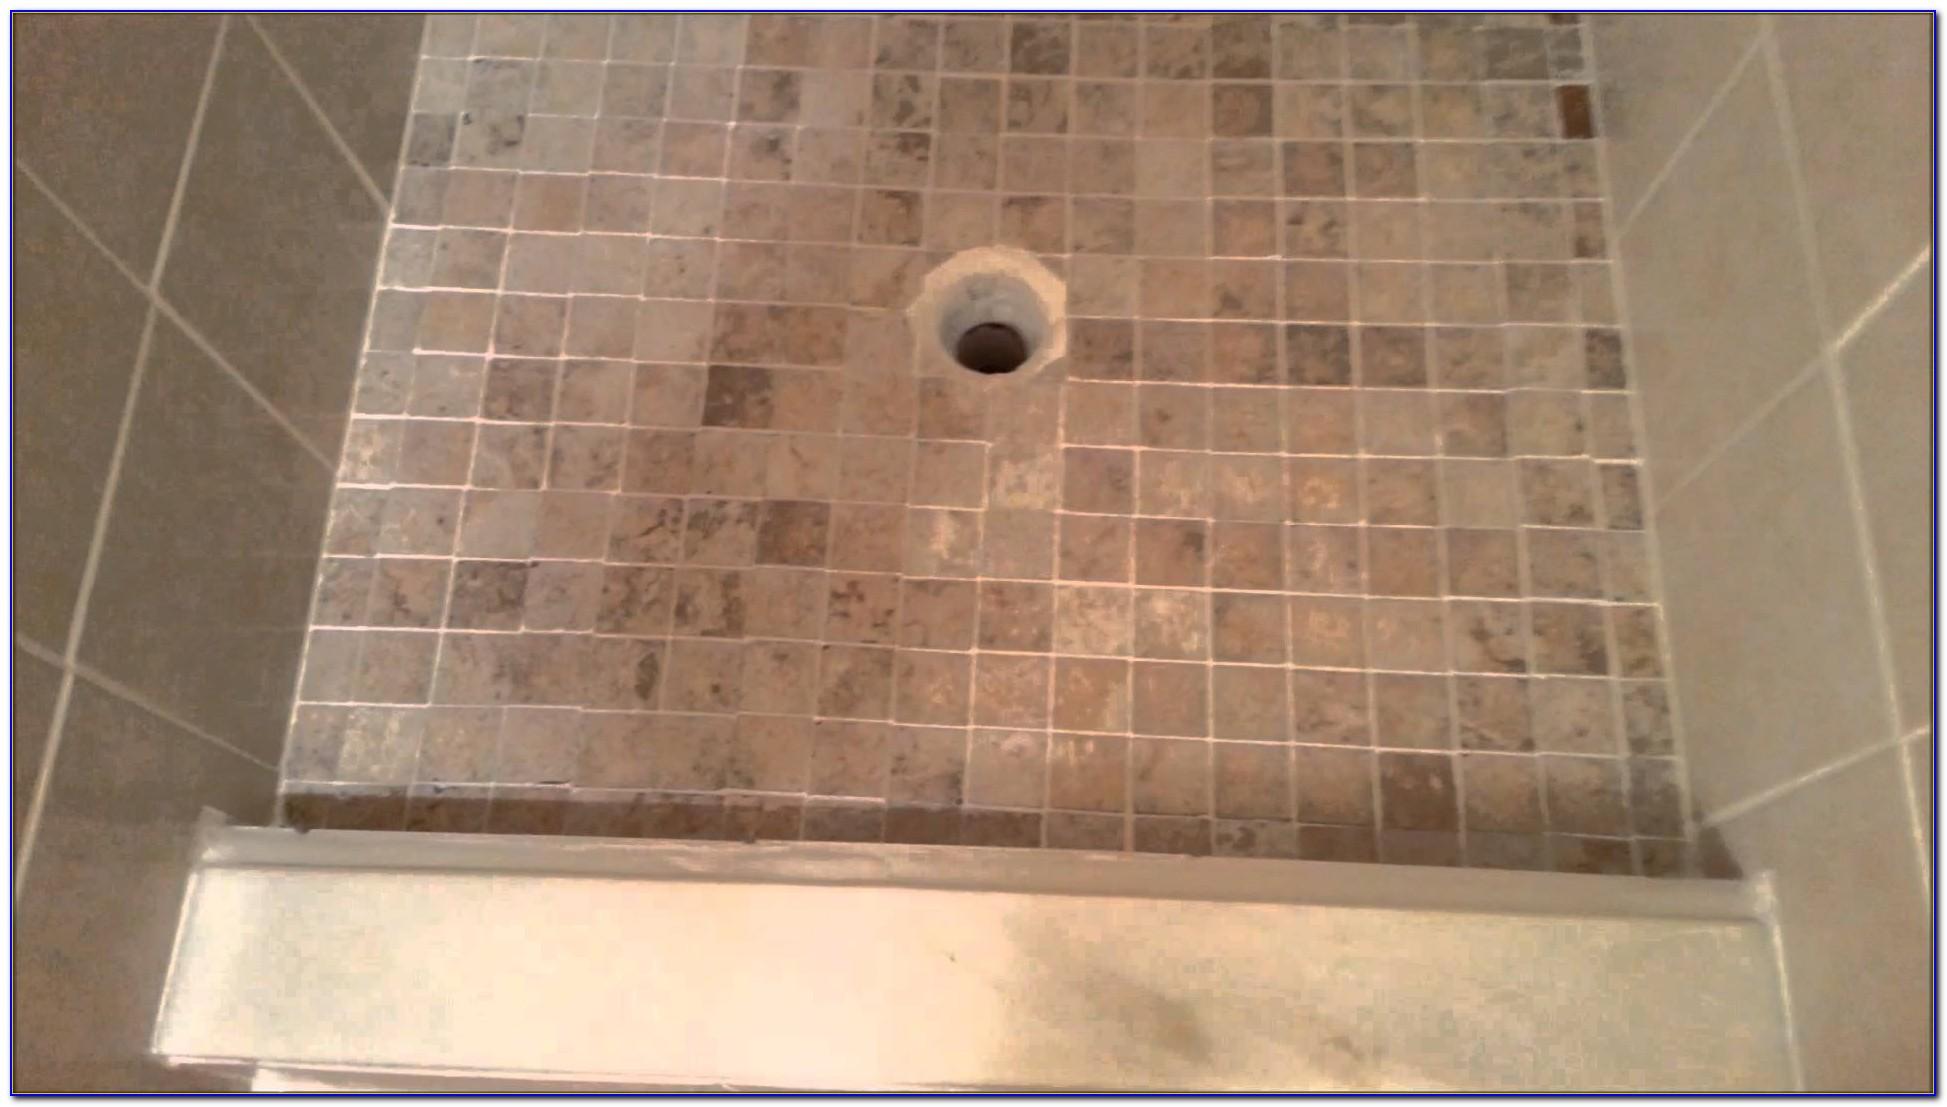 Tile Ready Shower Pan 36 X 60  Tiles  Home Design Ideas k2DW3RWDl367833